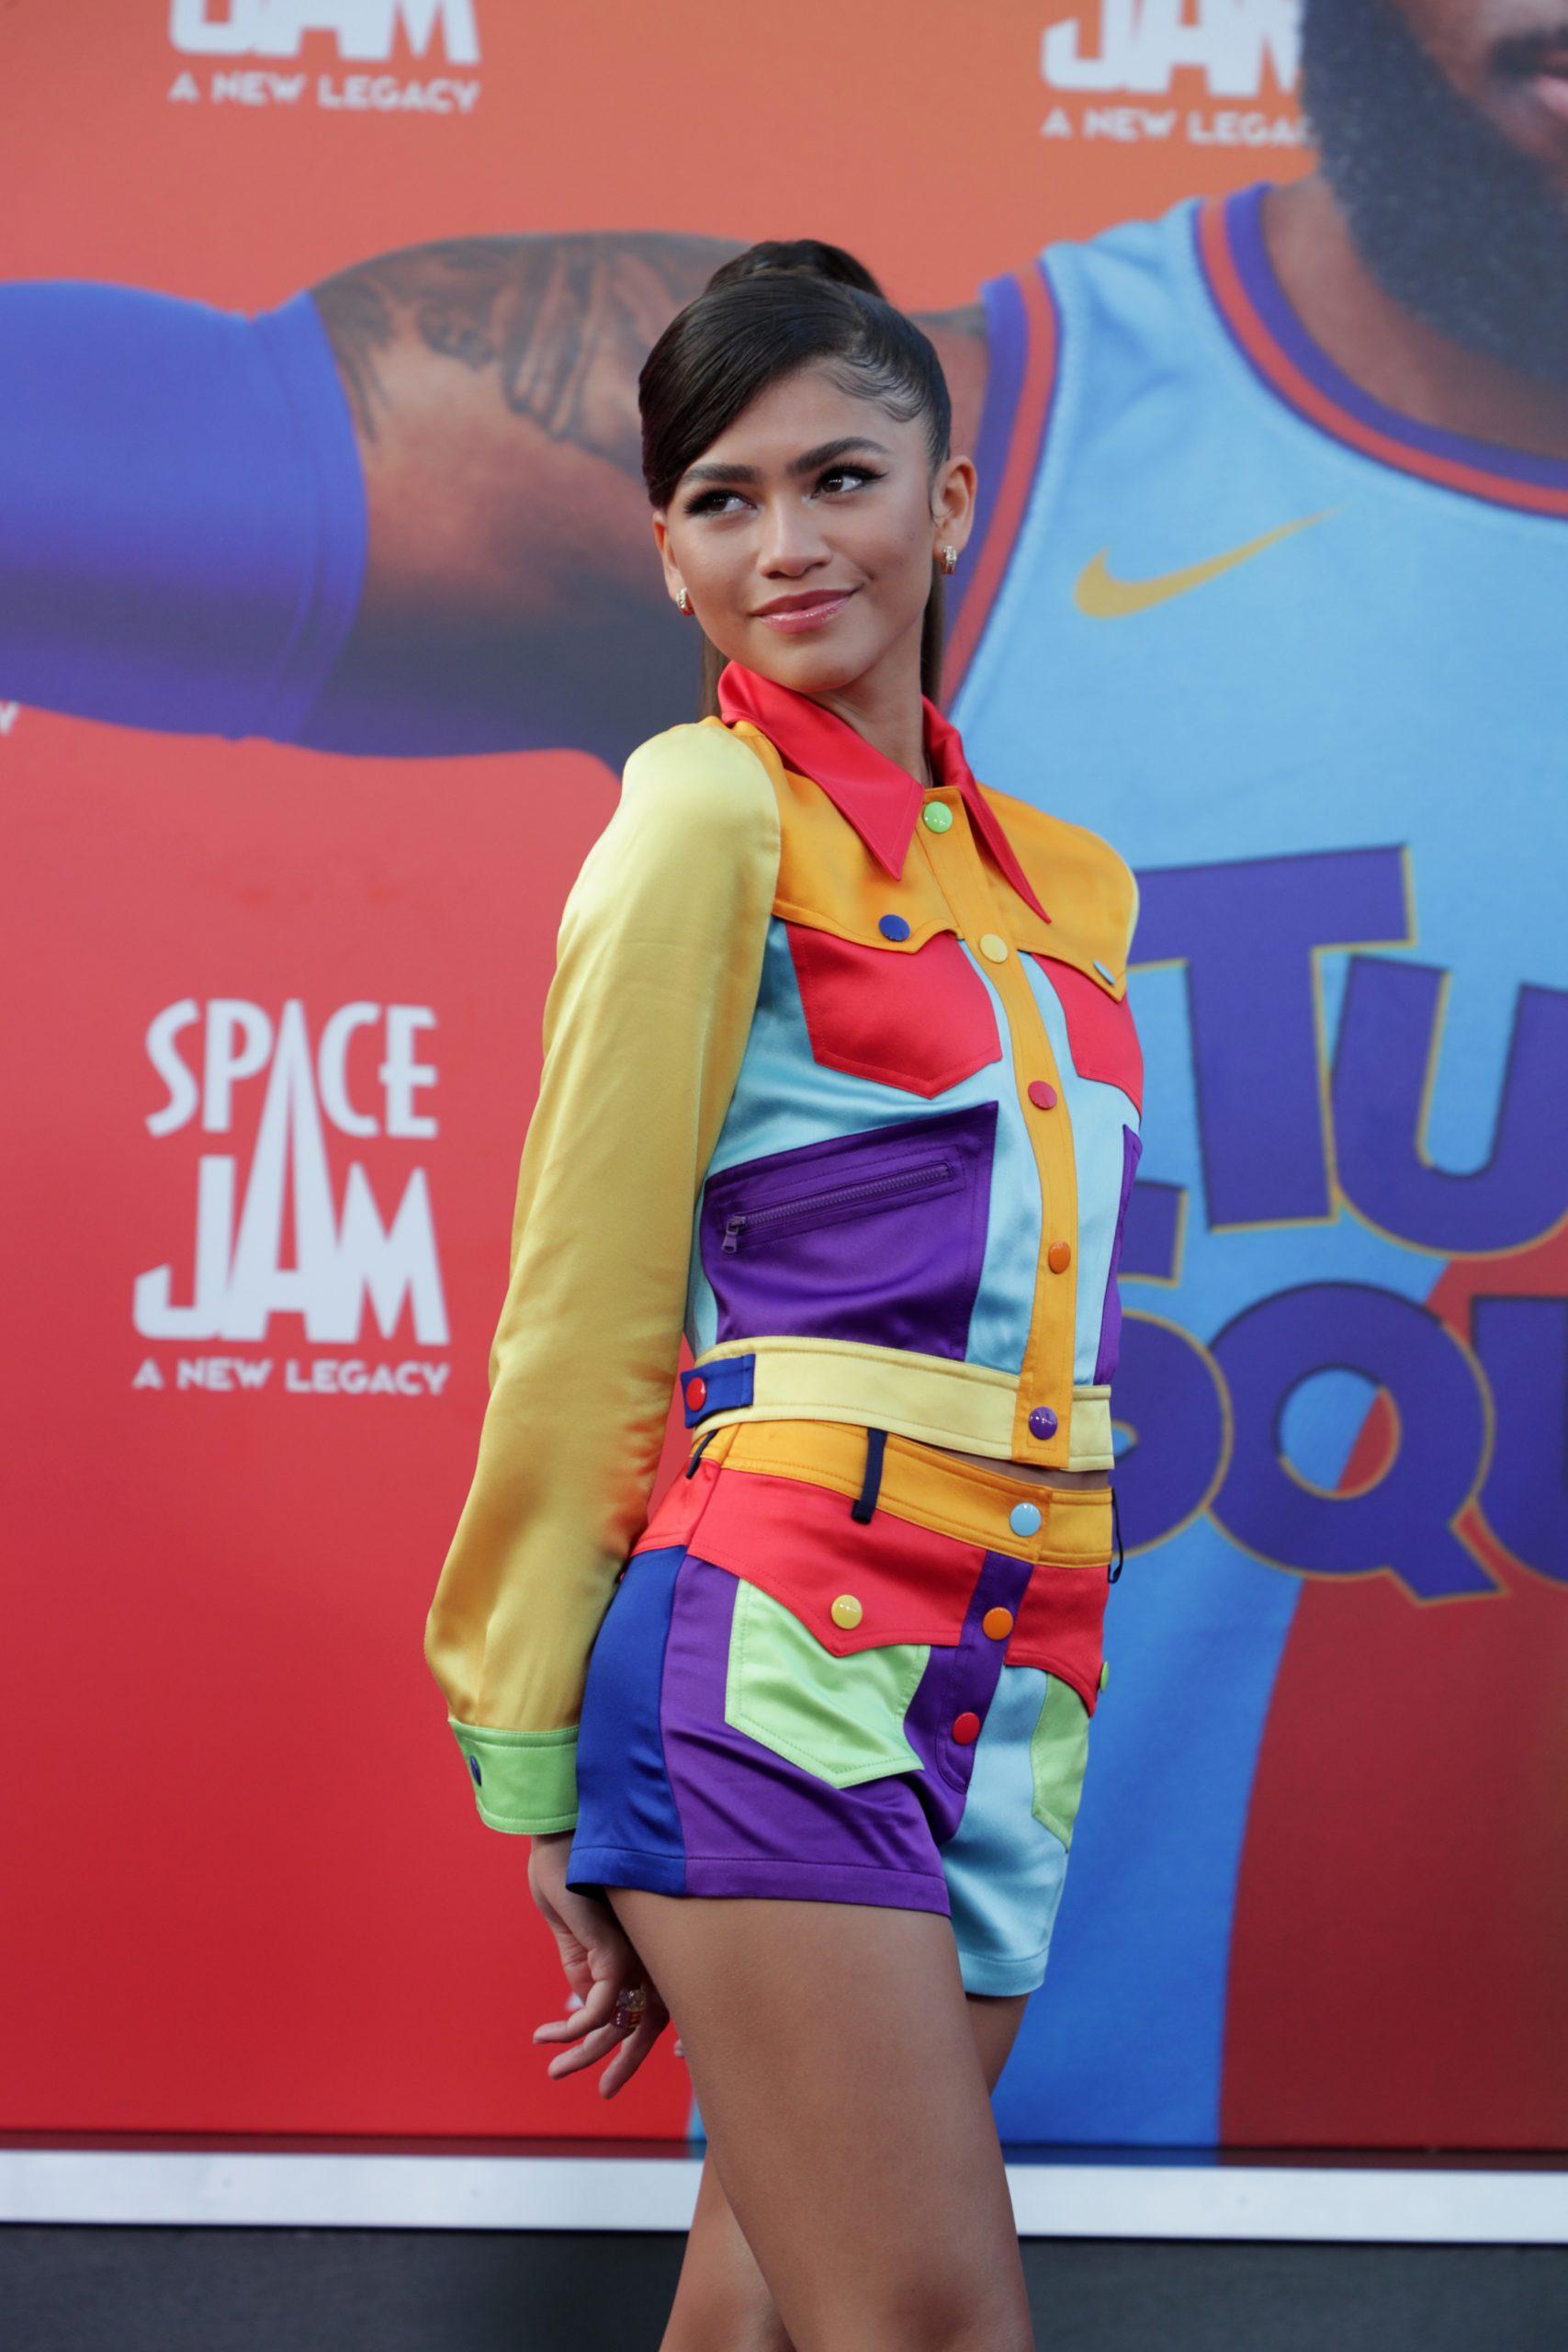 Wardrobe Breakdown: Zendaya Coleman Ất 'Space Jam: A New Legacy' Premiere